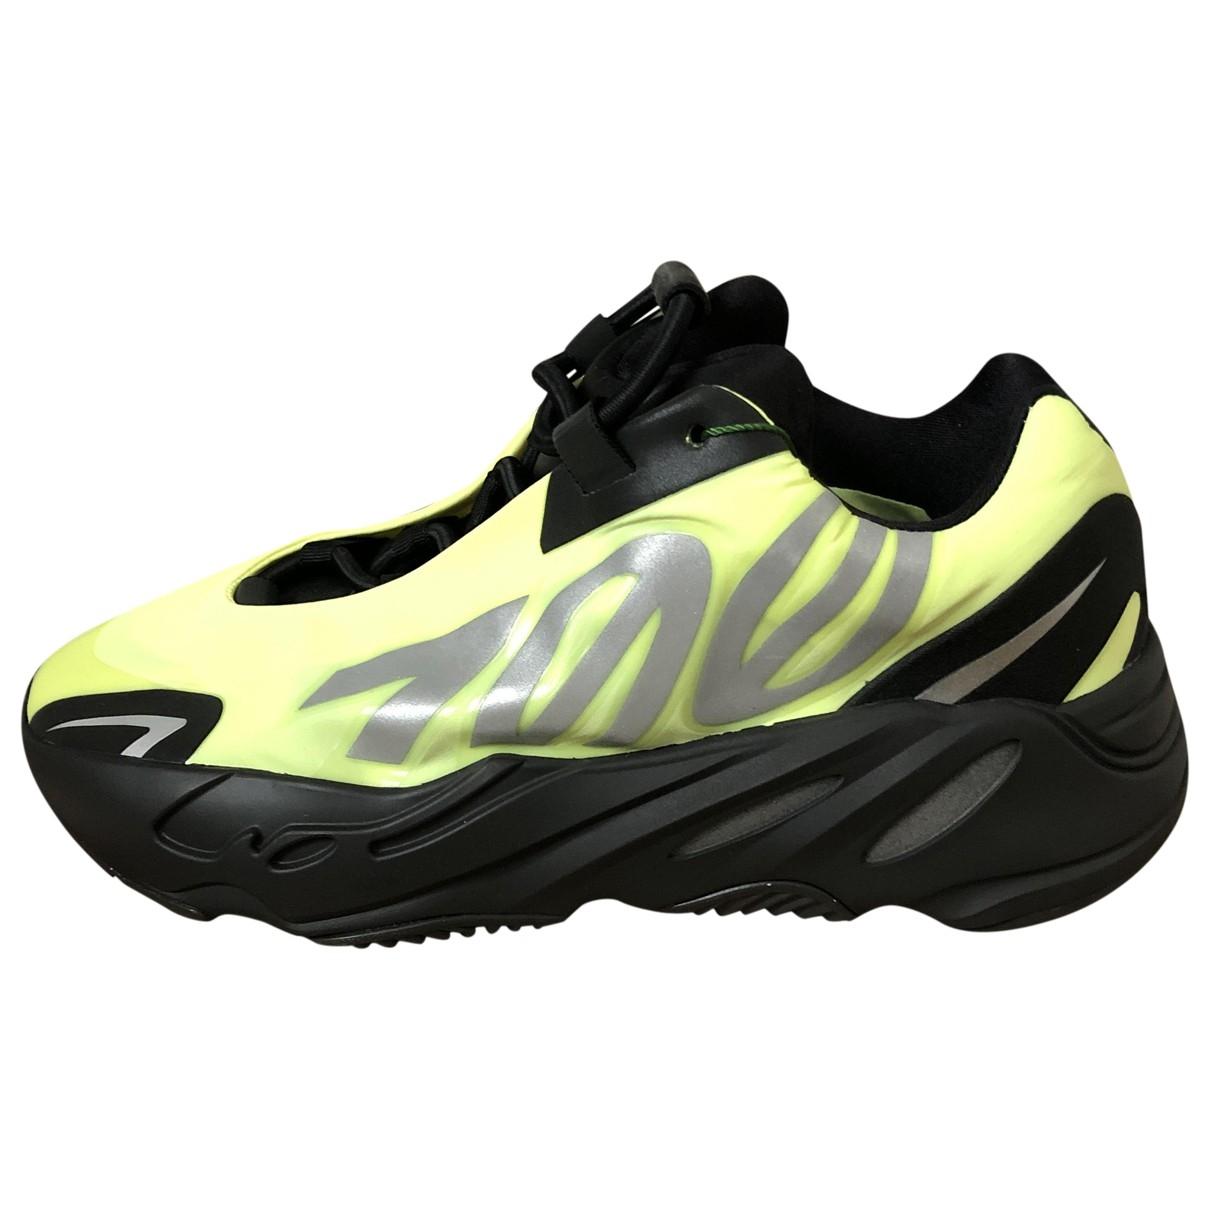 Yeezy X Adidas 700 MNVN PHOSPHOR Black Trainers for Women 6 US